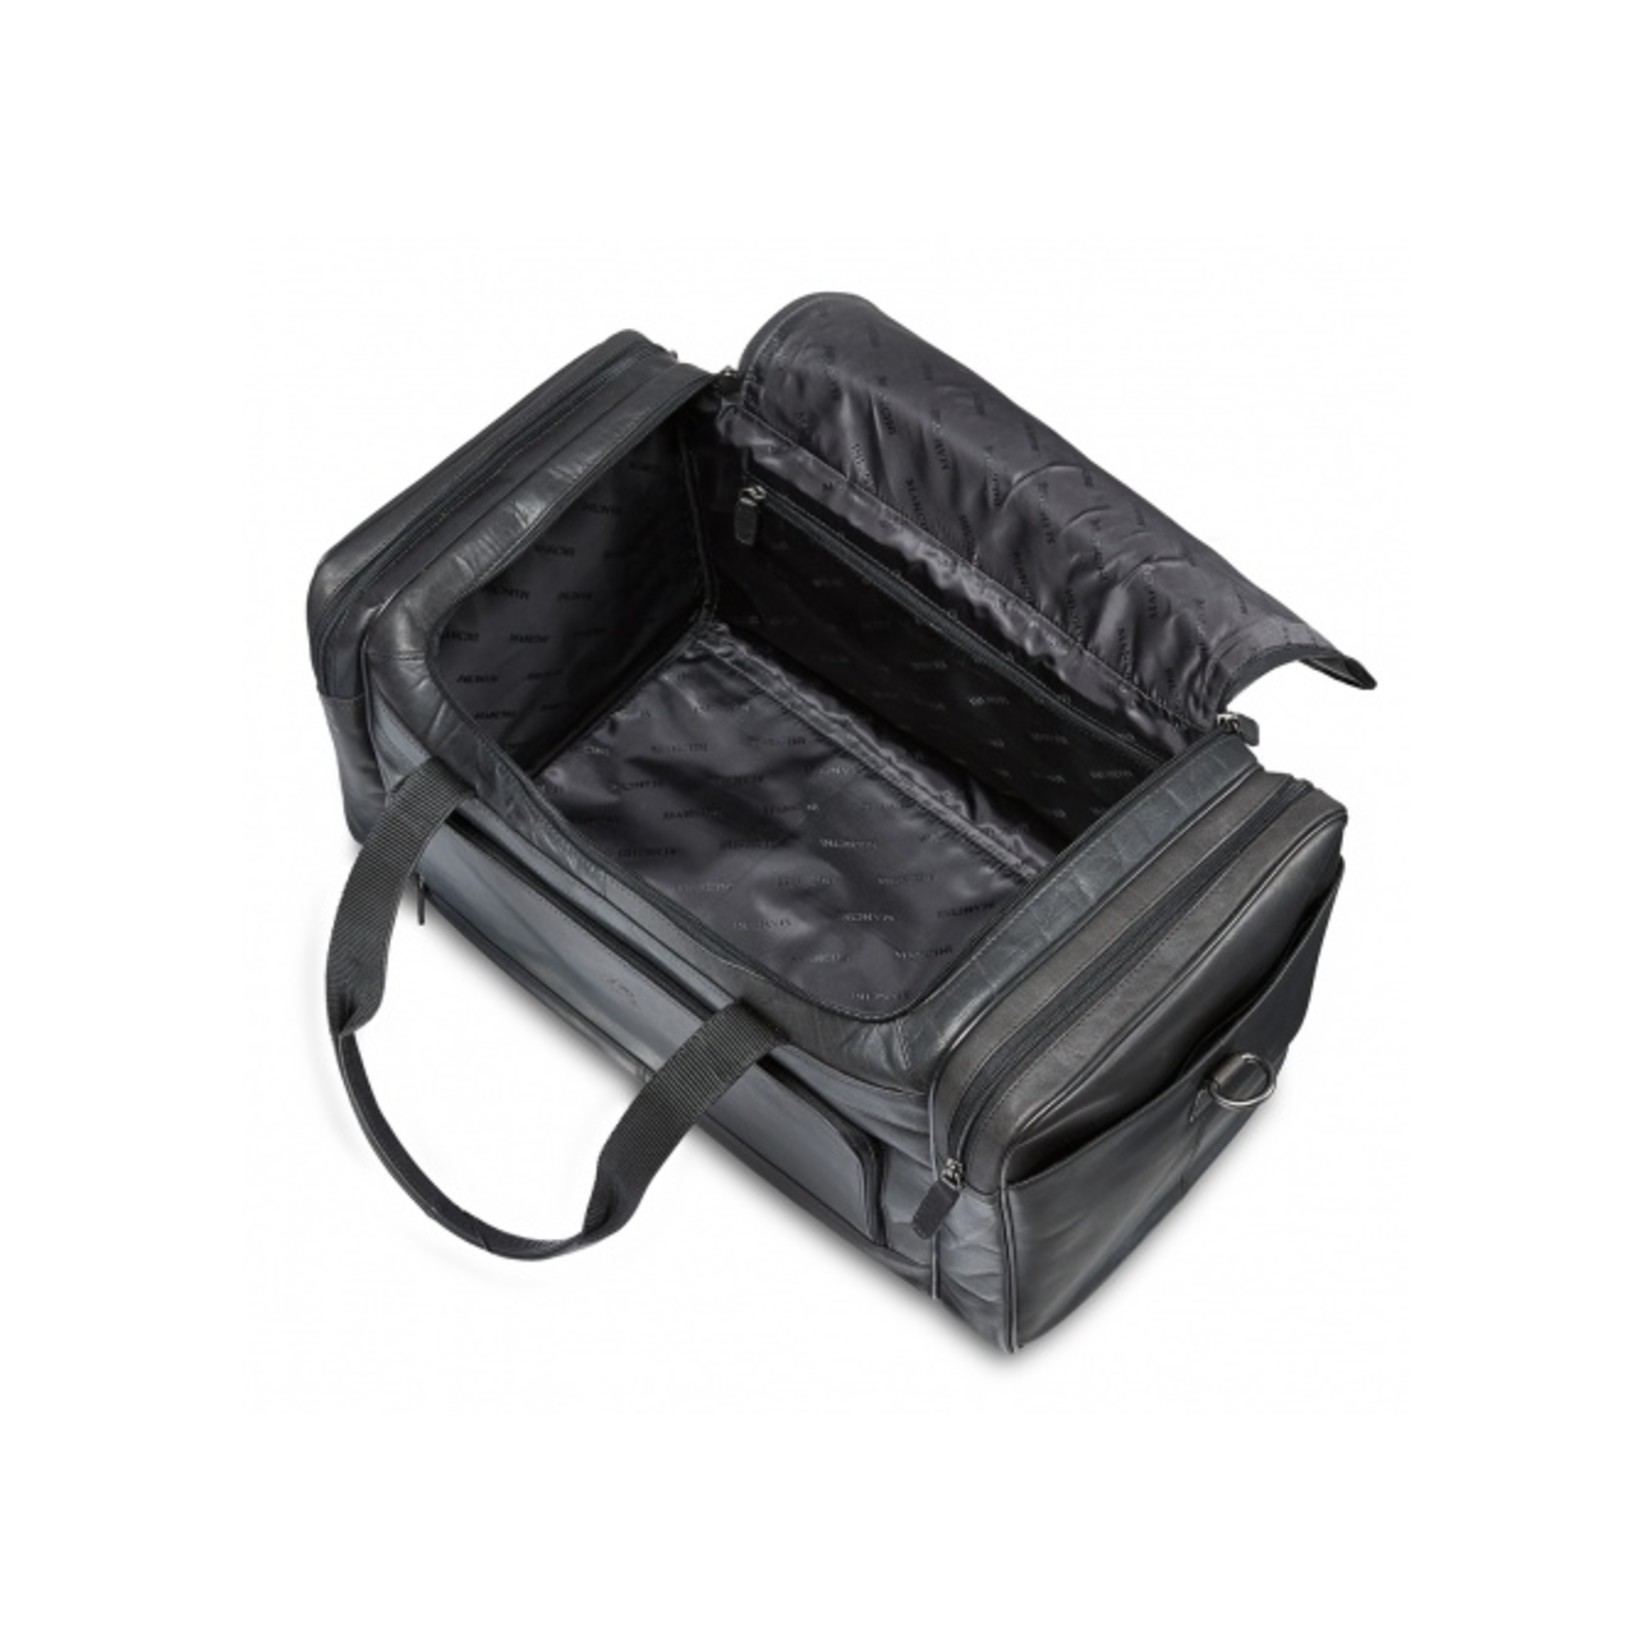 Mancini Mancini 99-5470 Carry-On Duffle Bag